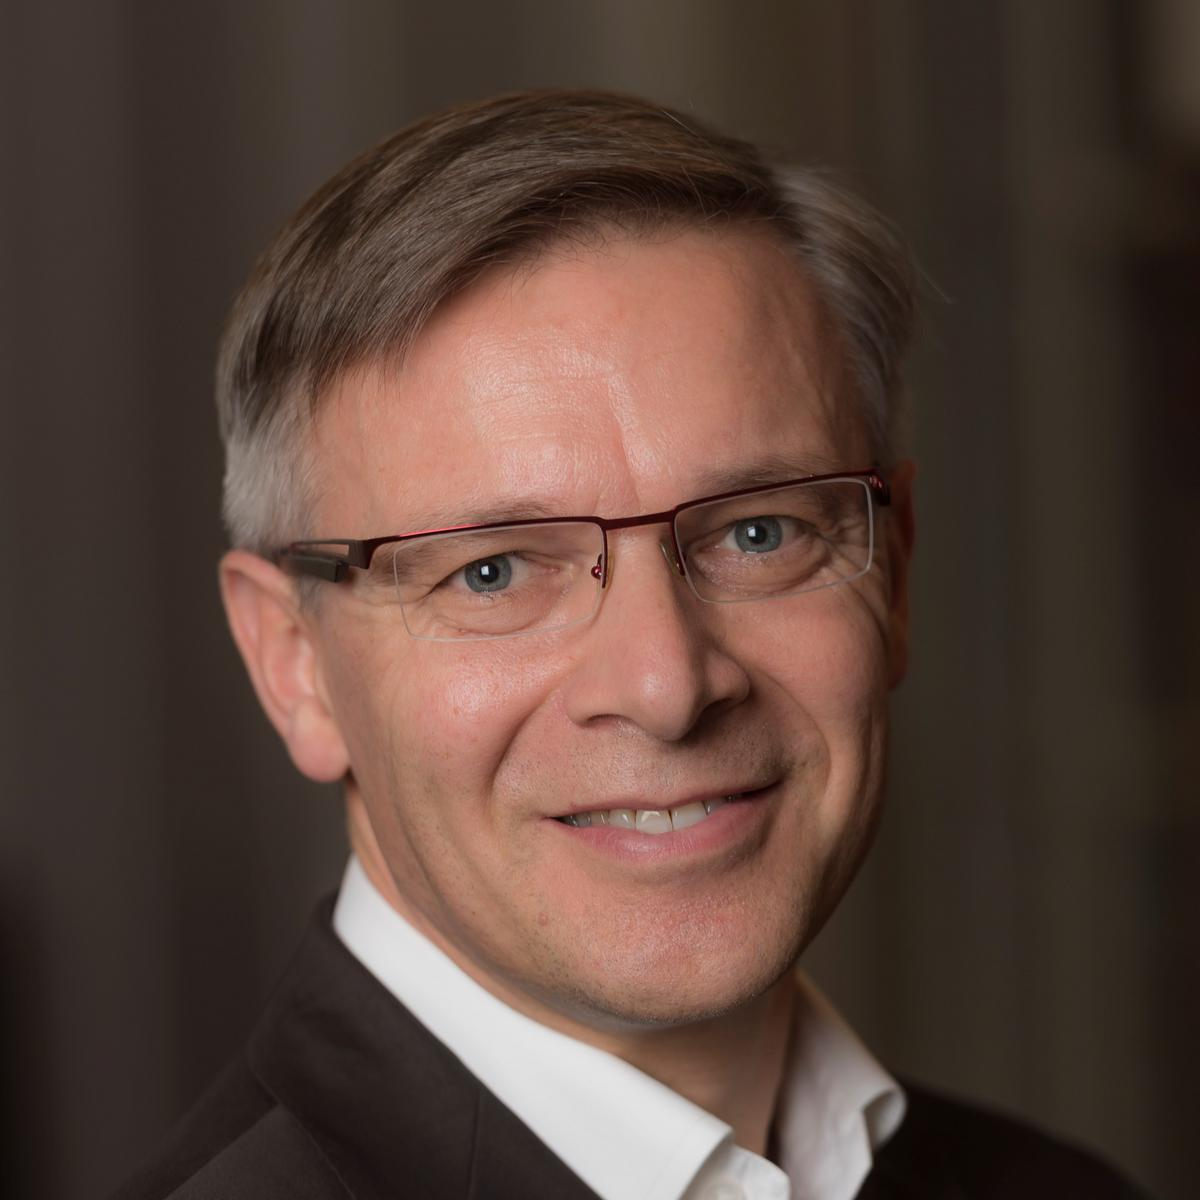 President Martin Pilka, president Kůlu Praha Česká republika